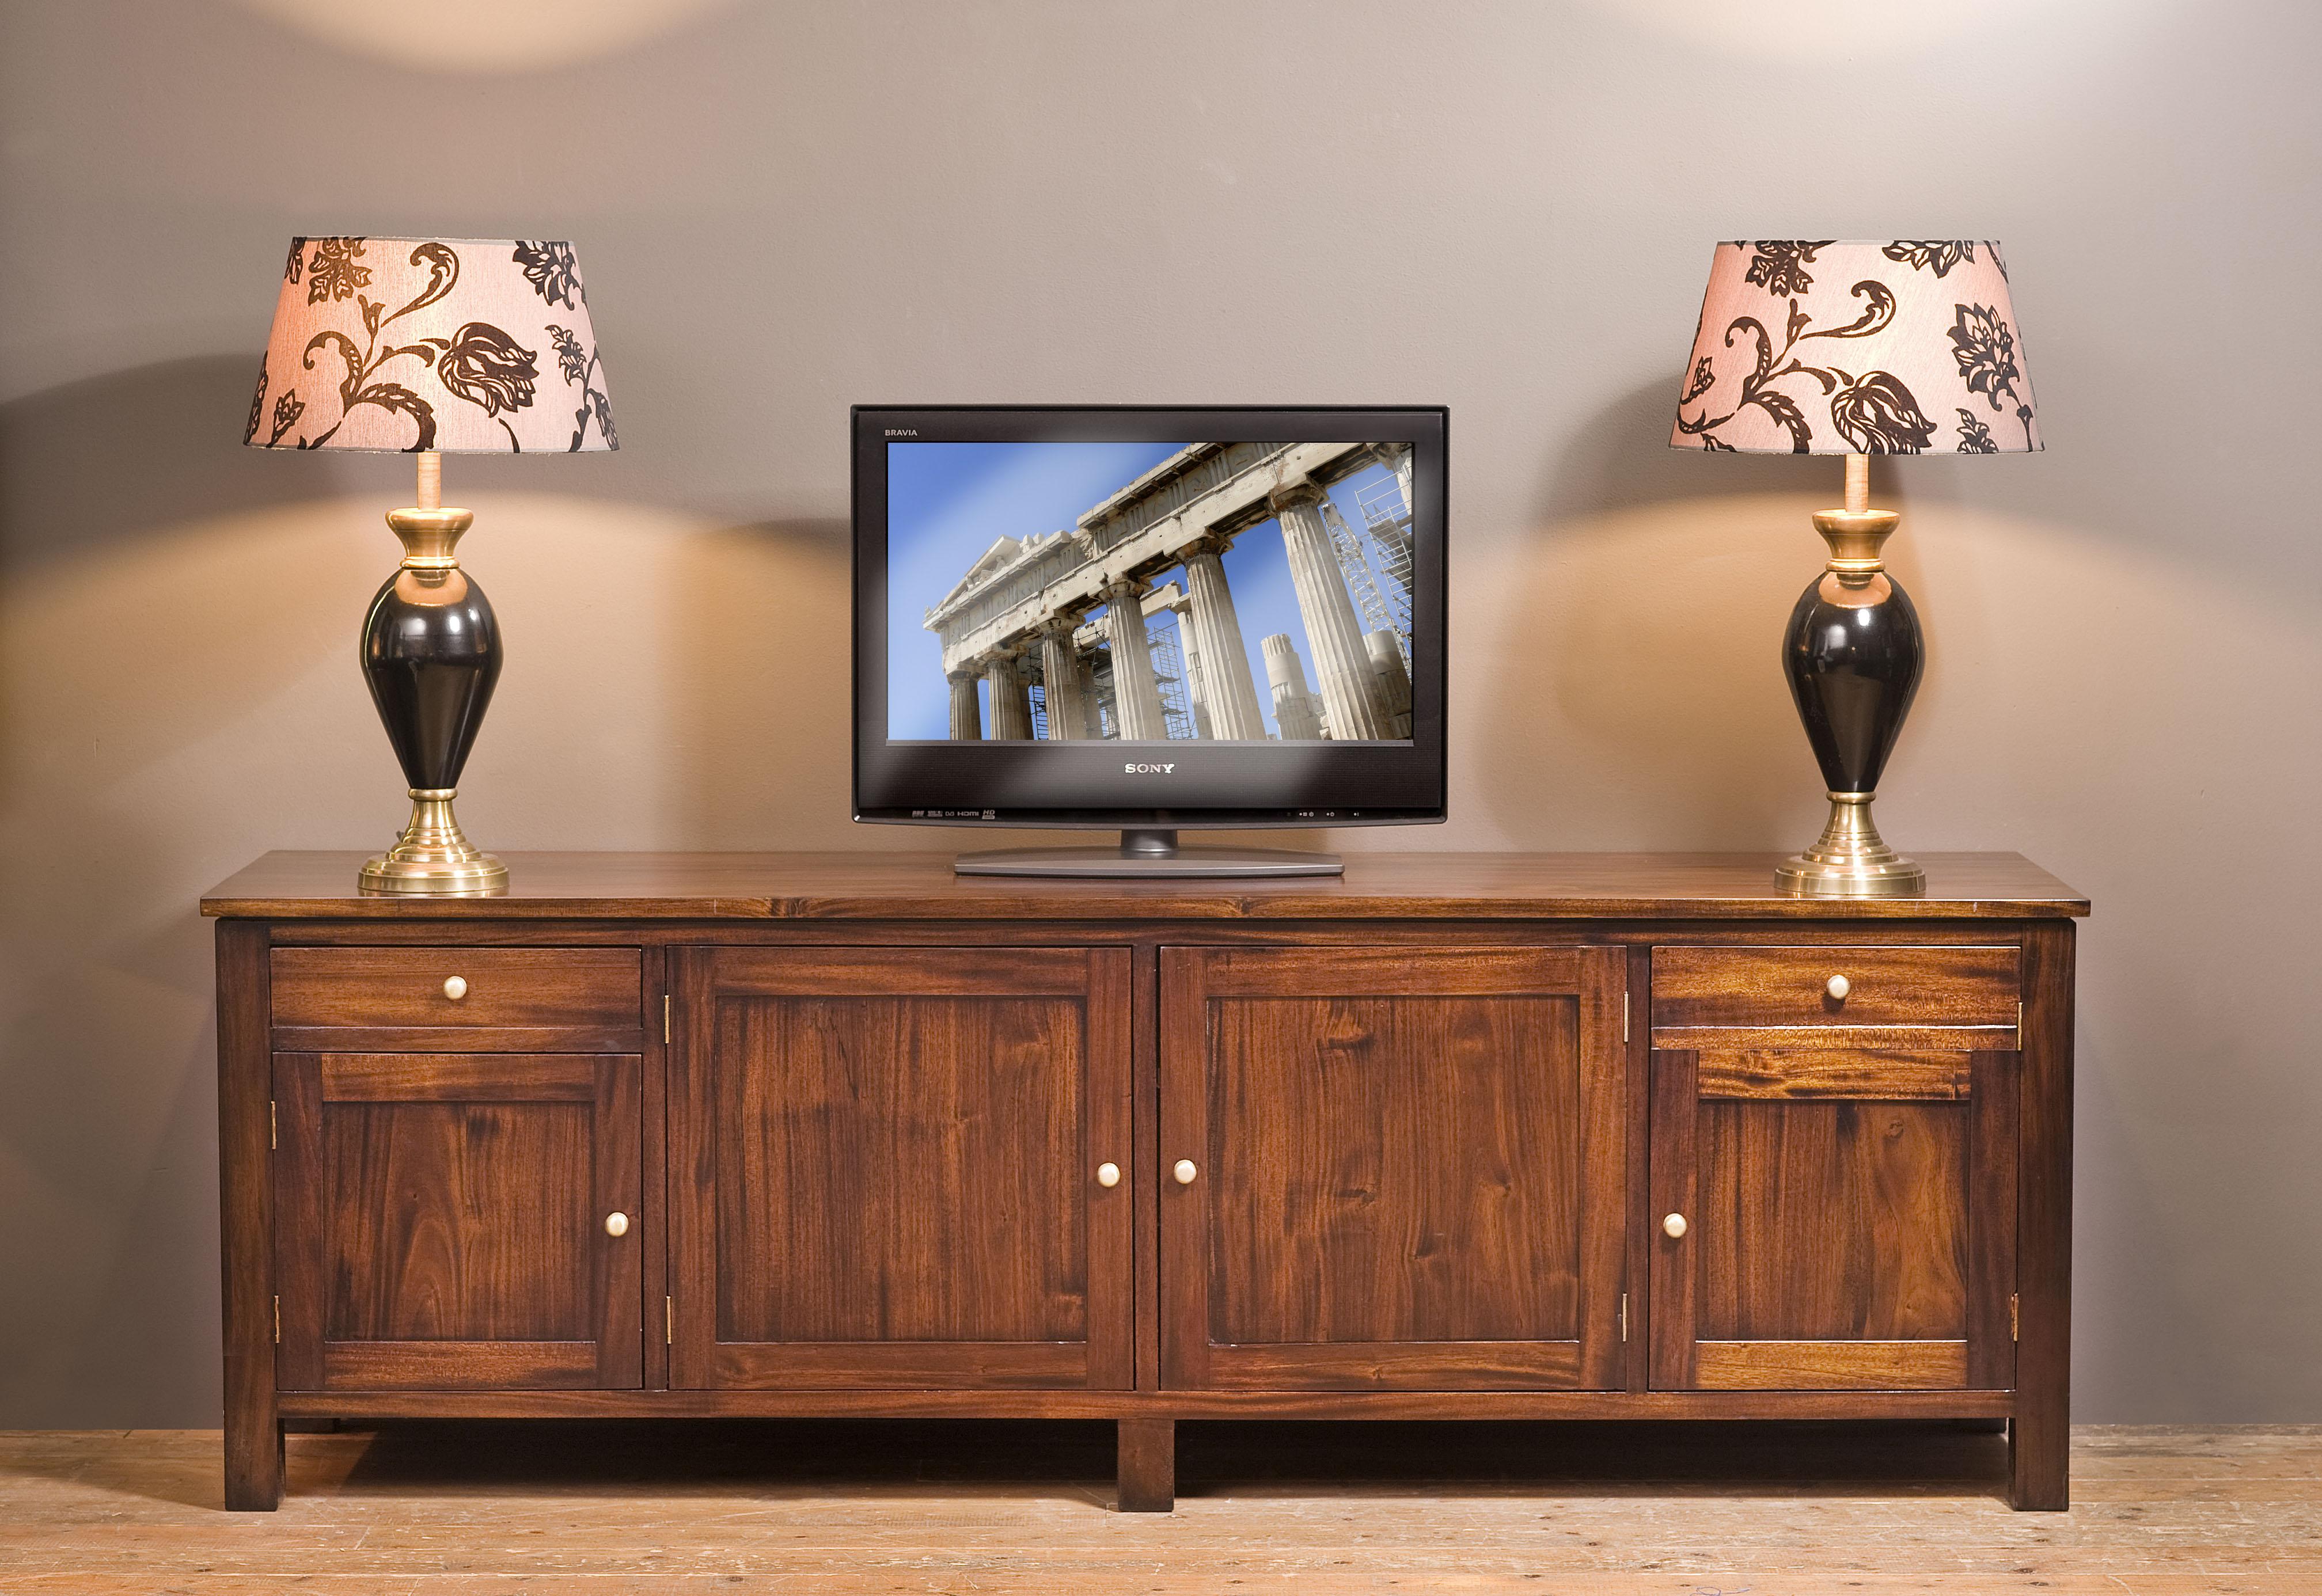 Mahonie Tv Meubel : Mahonie tv meubel straight mr. higgins